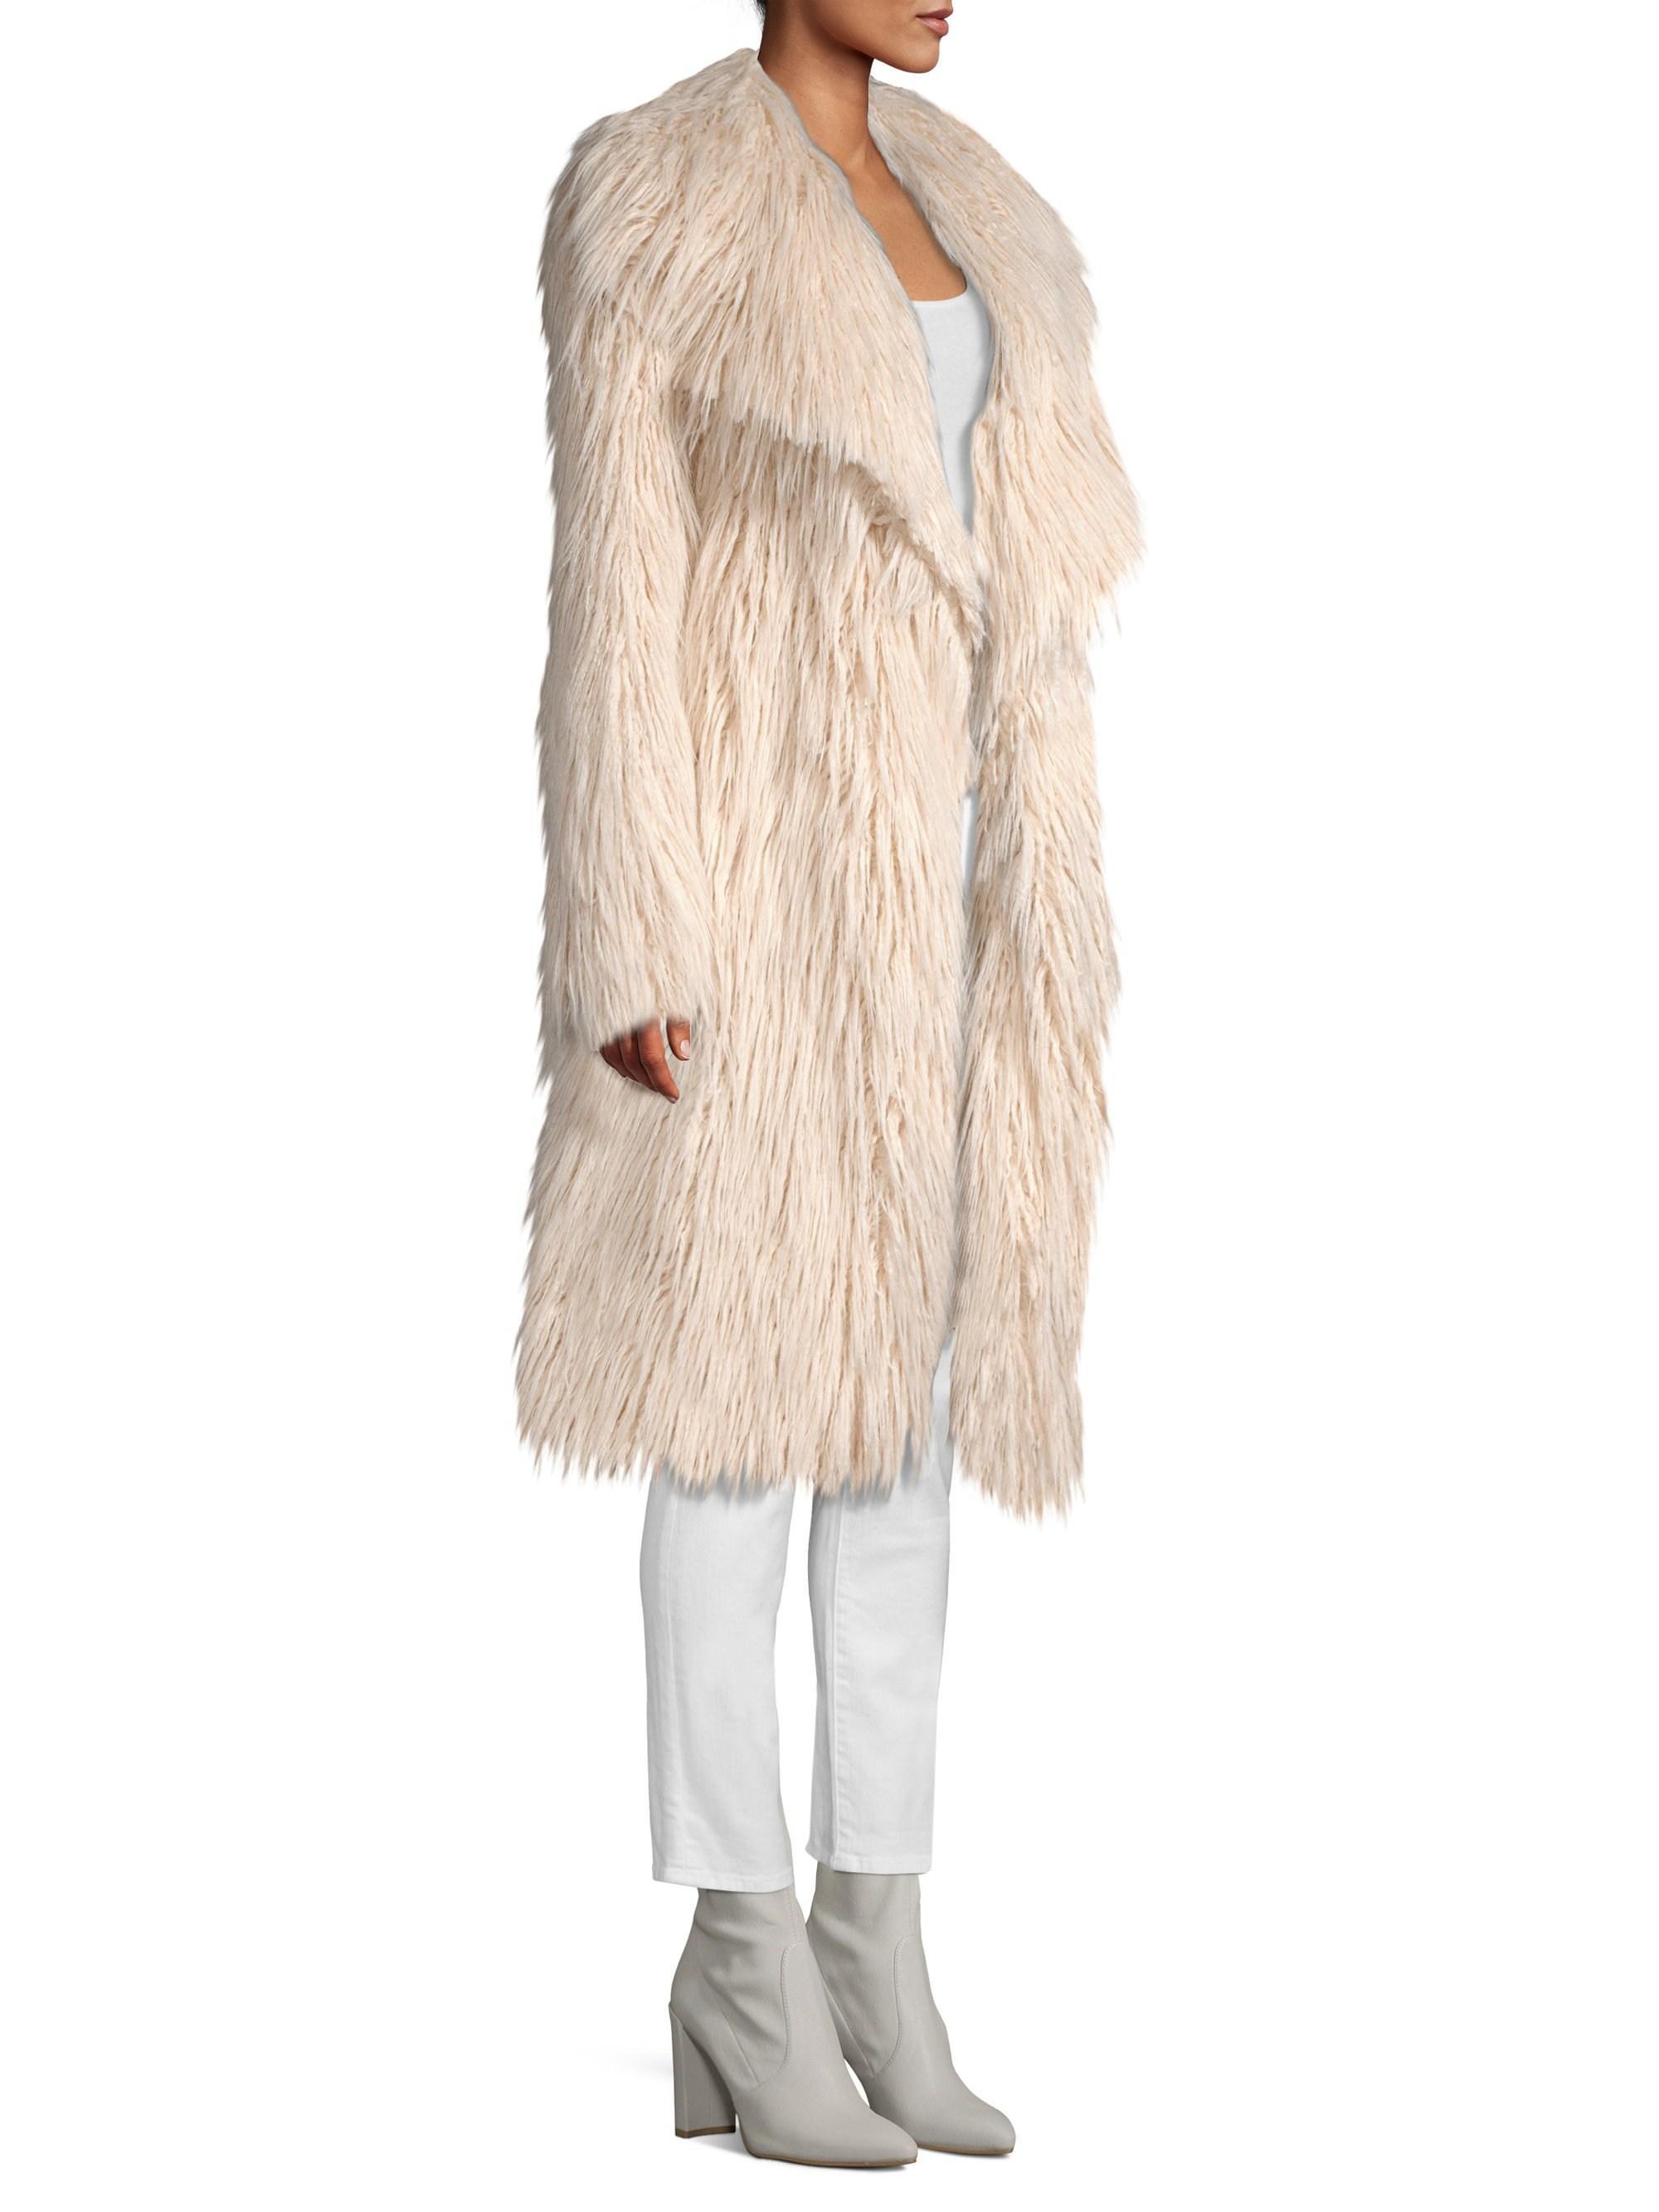 fd62b8a2ca74 MILLY Women's Riley Long Faux Fur Coat - Ecru in Natural - Lyst